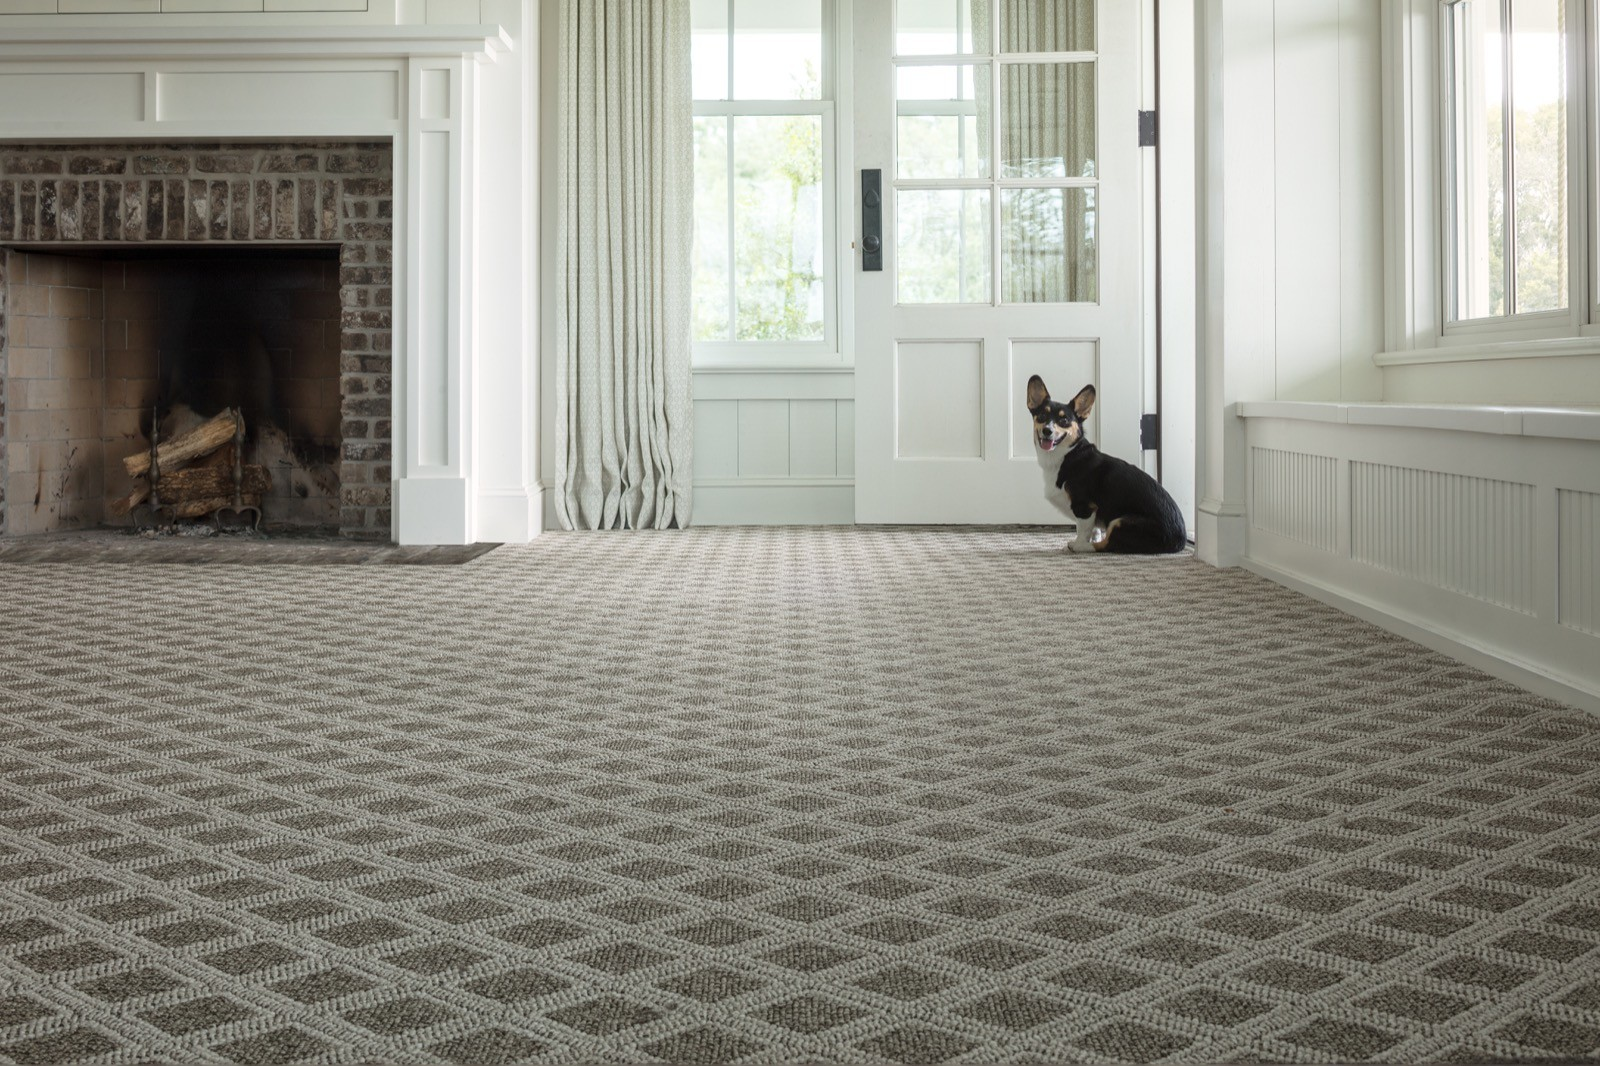 Dog sitting near door | West River Carpets